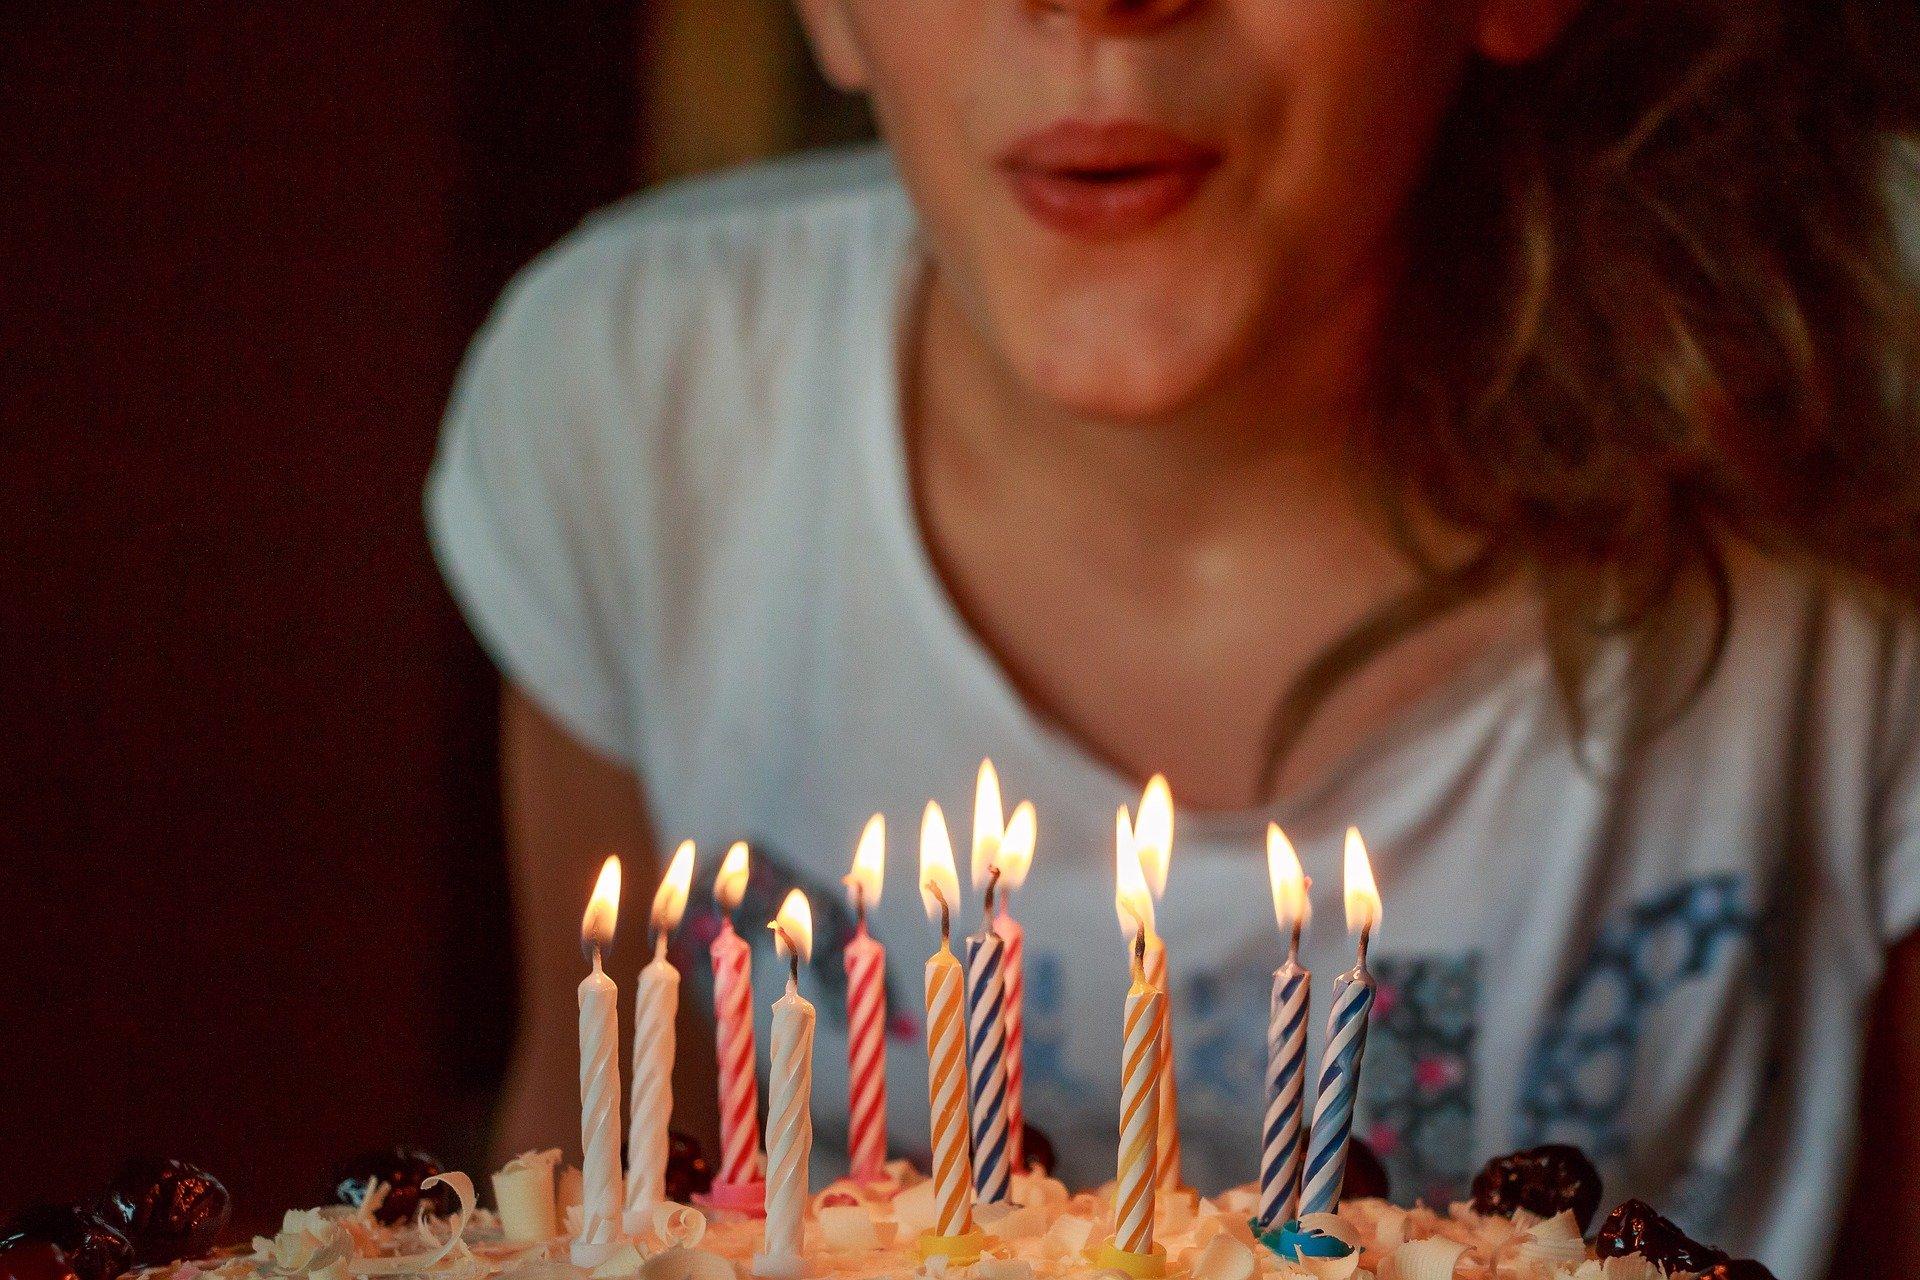 YOUNG-UNG Taekwondo Geburtstag Kinder feiern